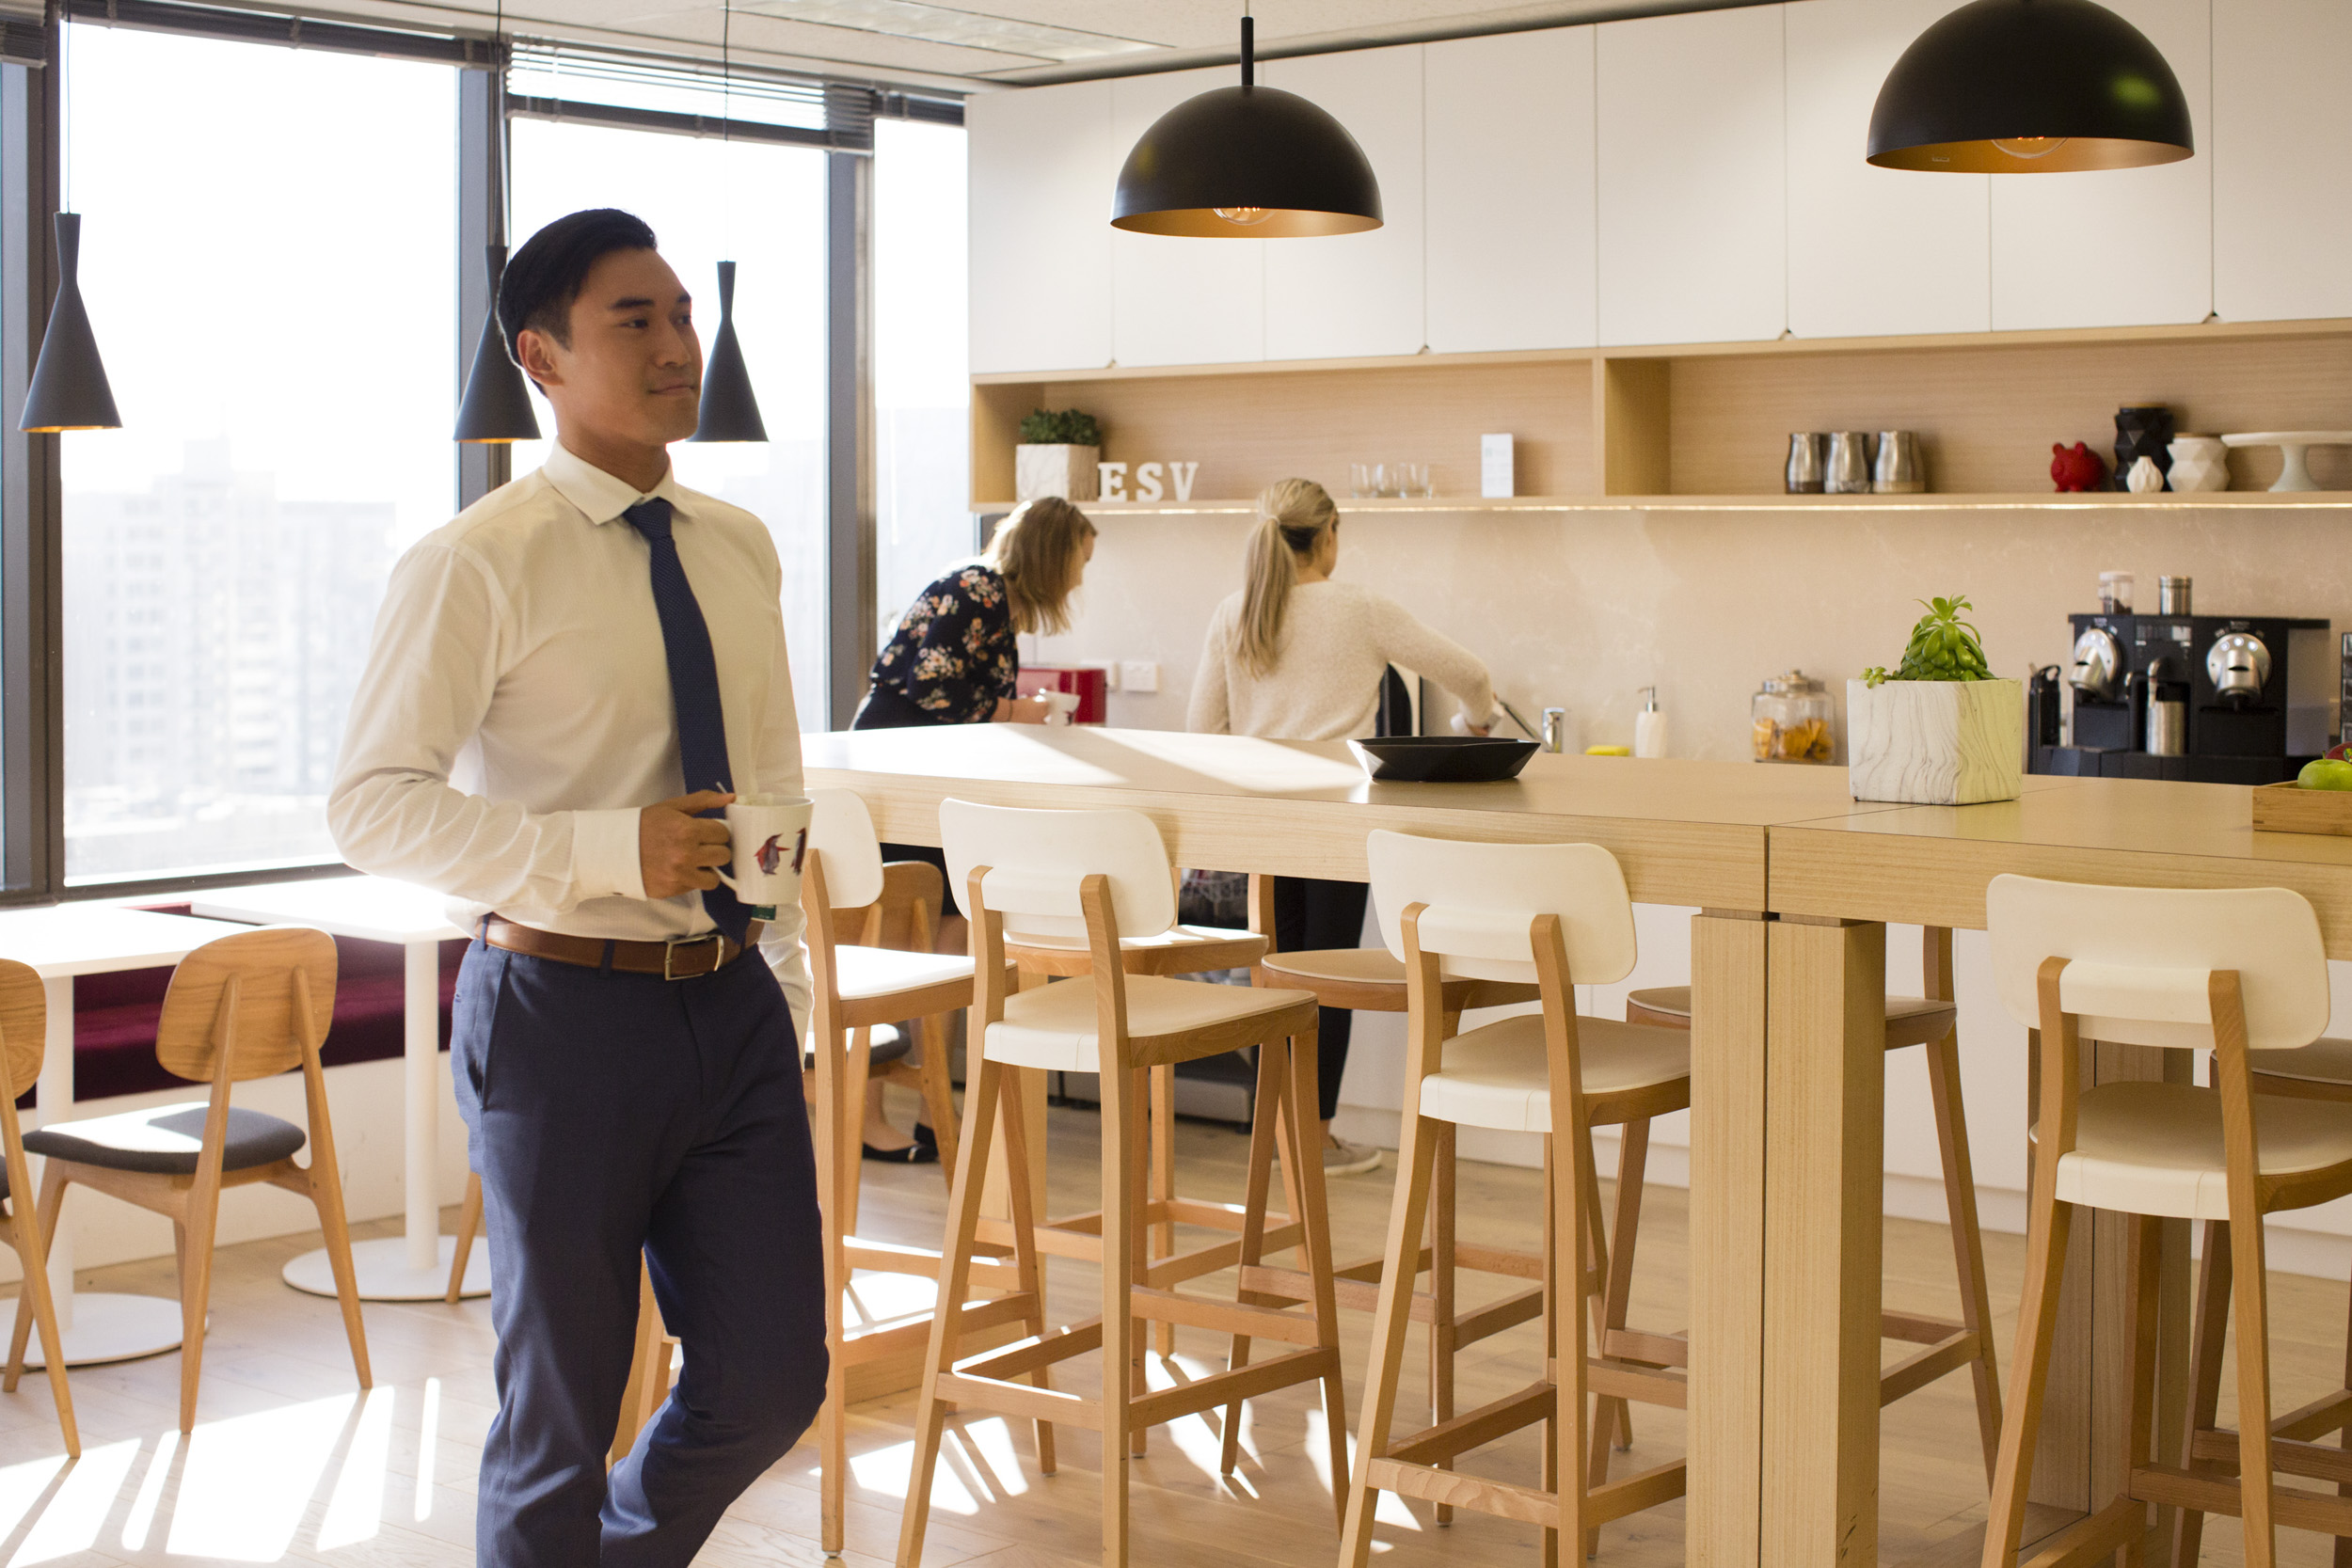 workplace-staff-portraits-Sydney-Australia_03.jpg